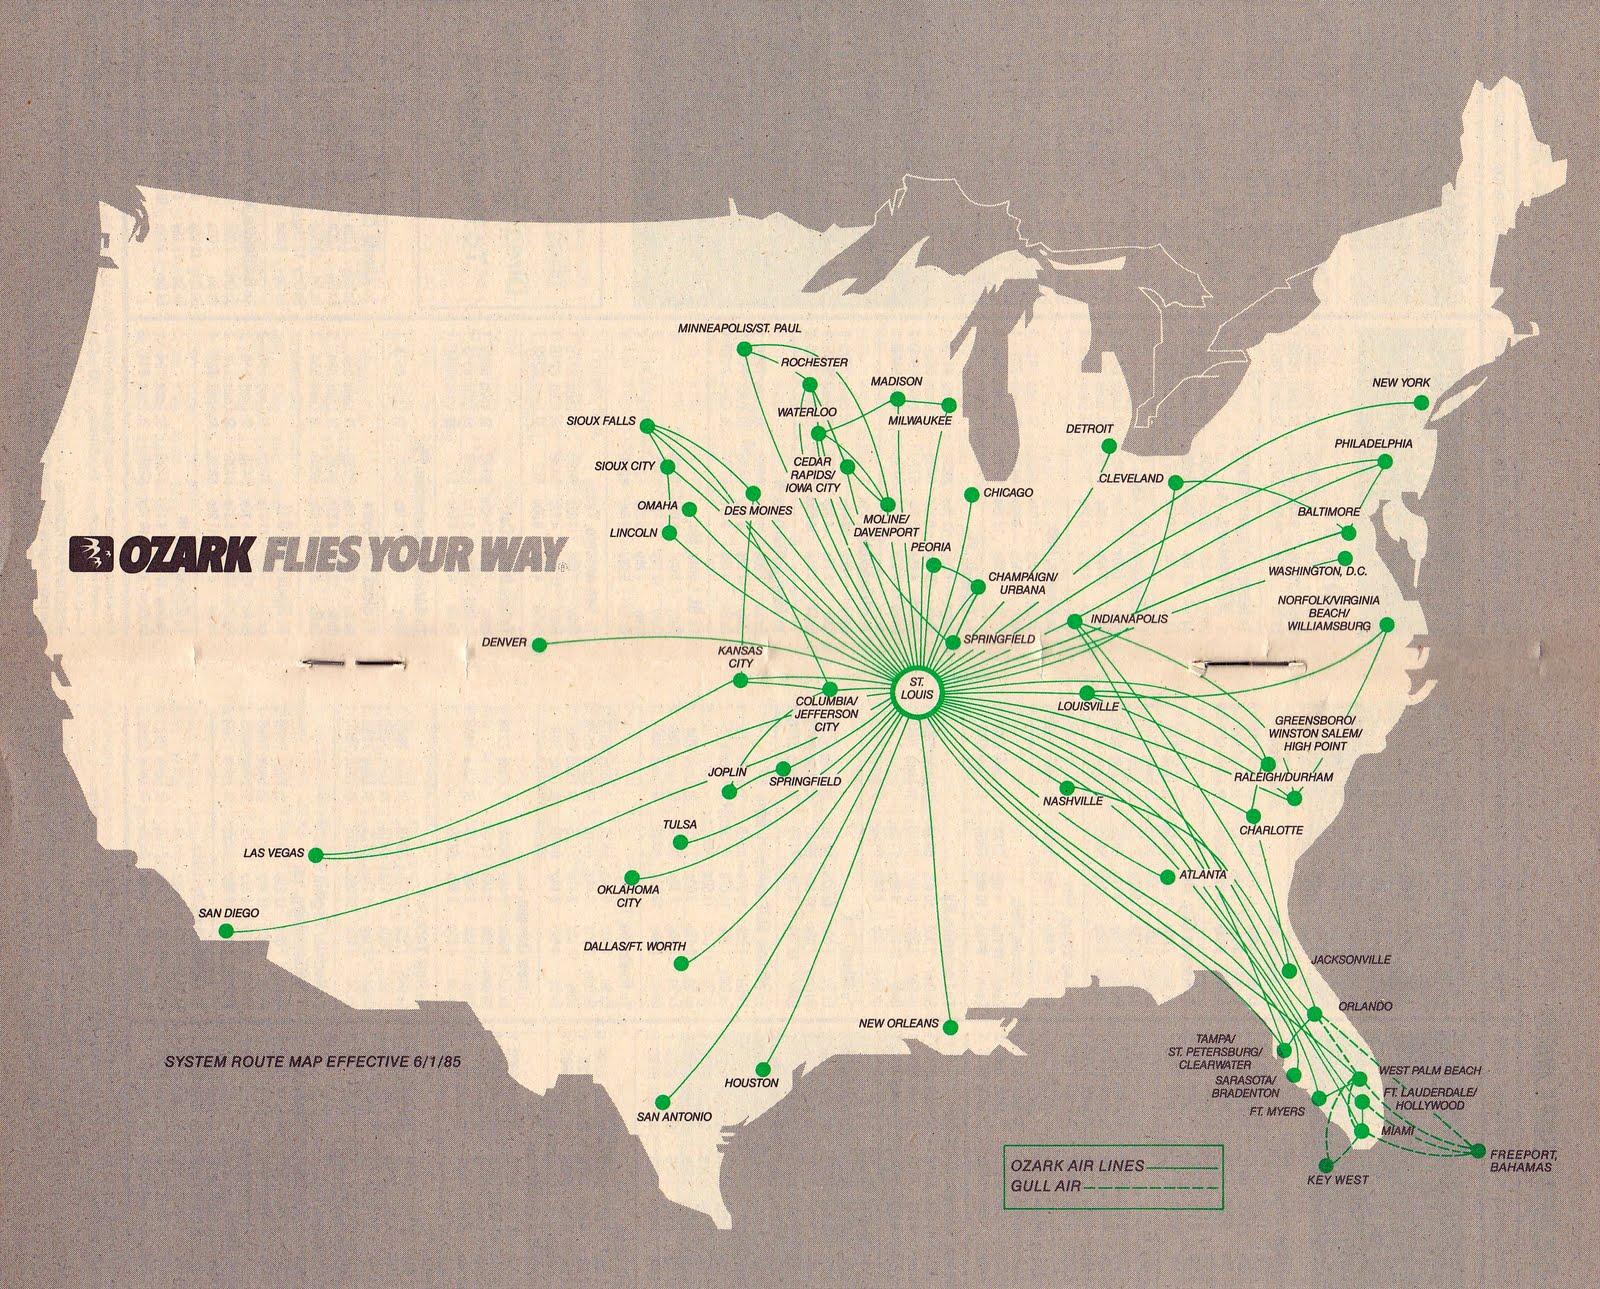 airline timetables ozark air lines june 1985